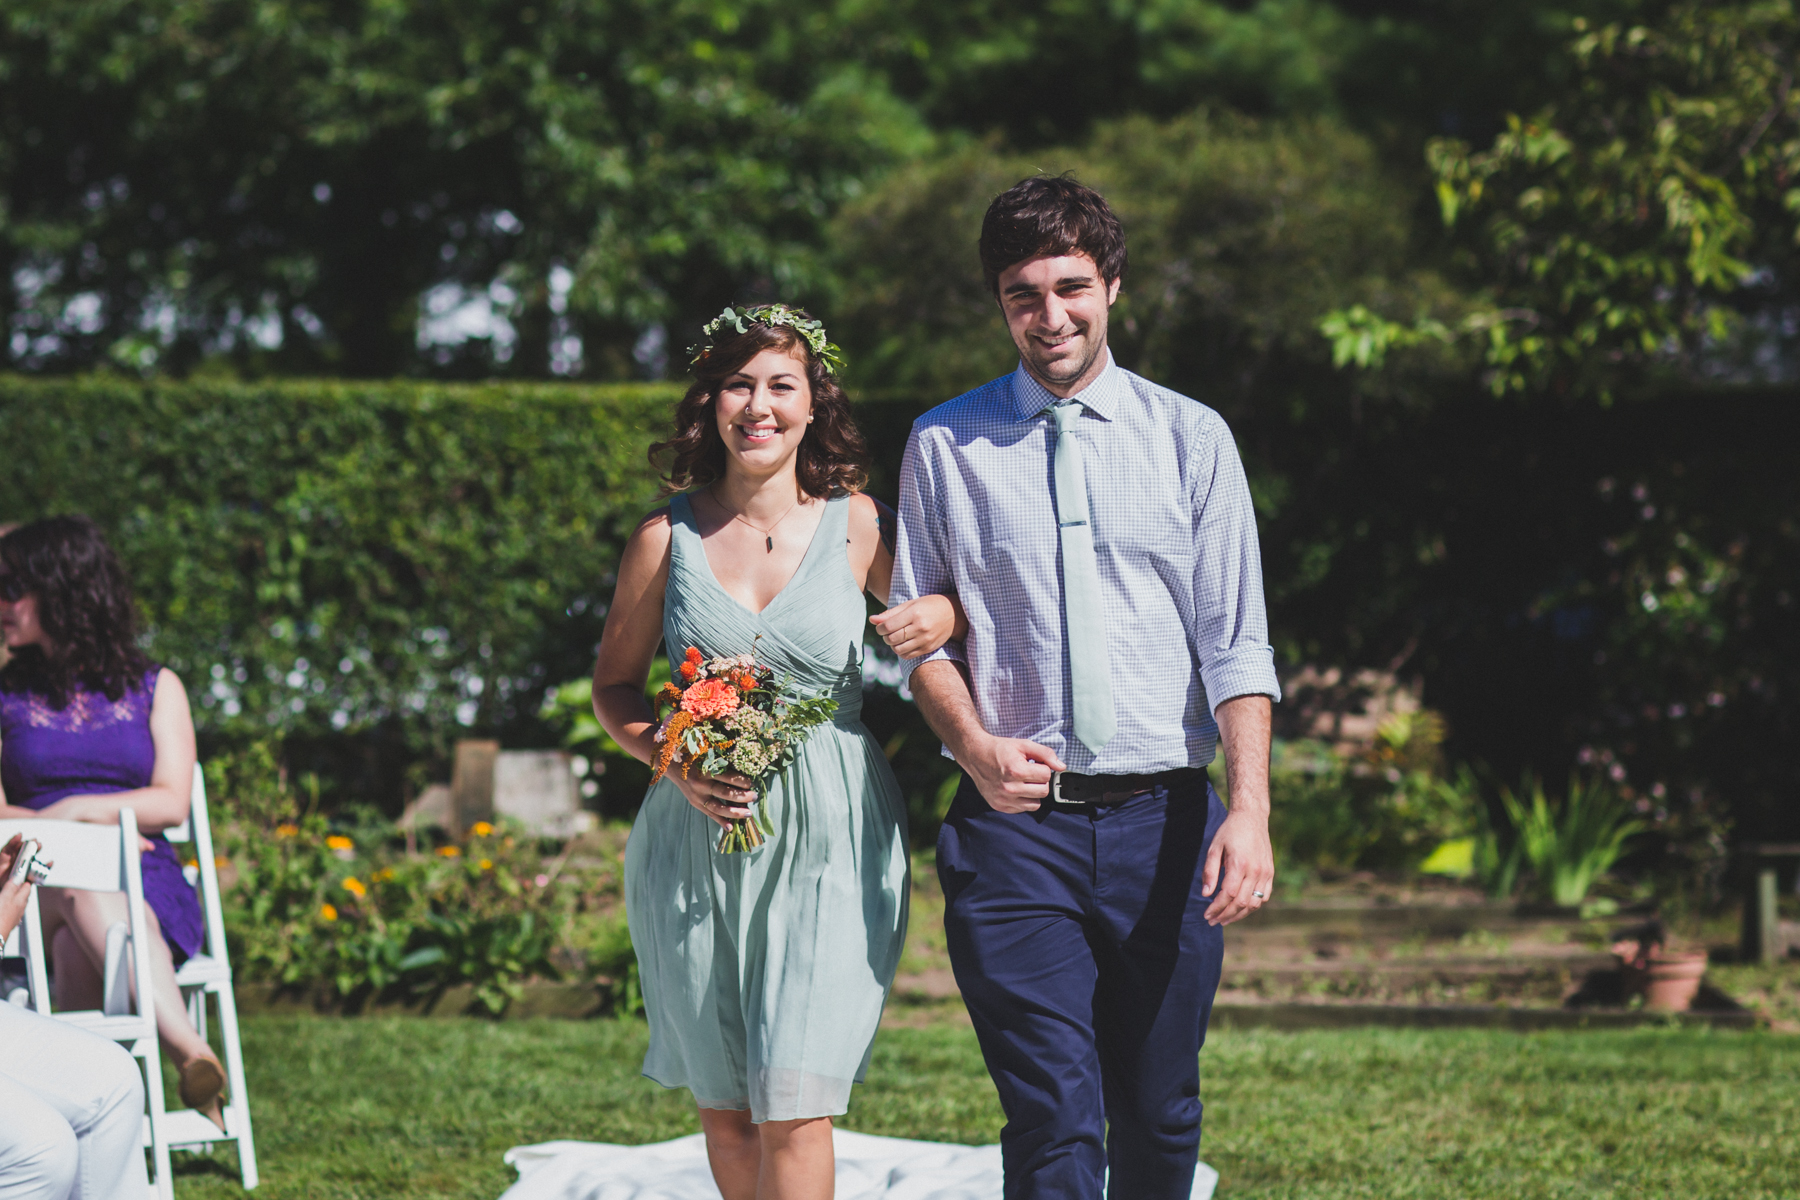 Long-Island-Documentary-Wedding-Photography-Summer-Tent-Wedding-in-New-York-57.jpg